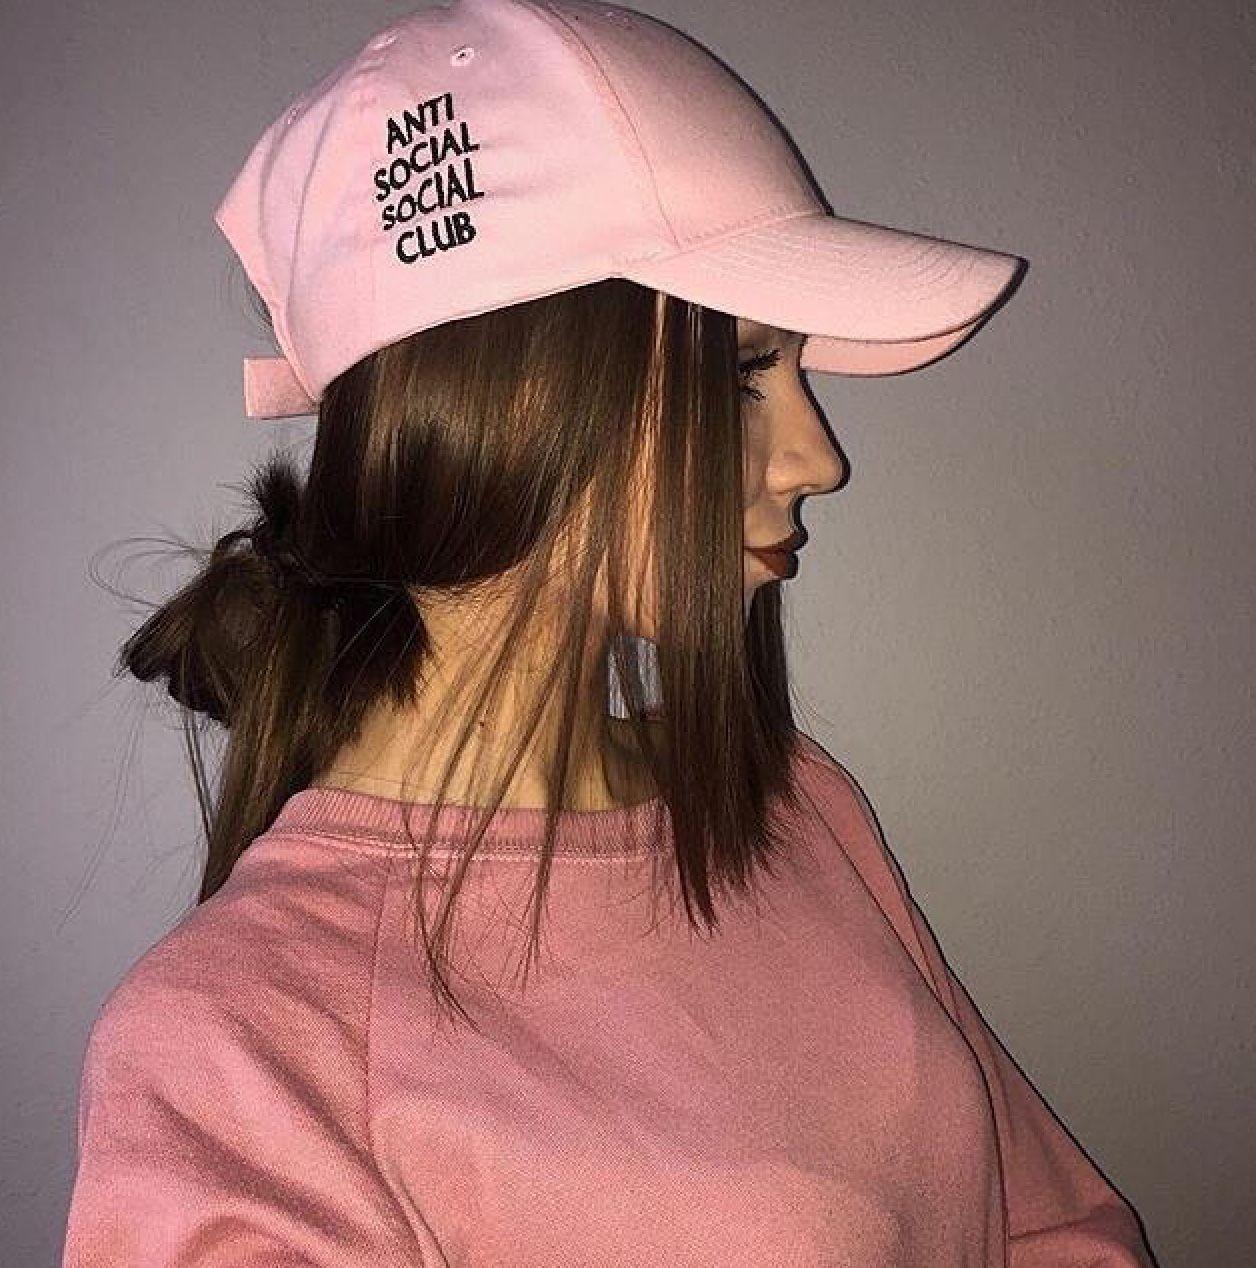 Tumblrgirls Girls Girl Model Inspirations Tumblr Pinterest Glamitalex Instagram Glamitalex Pink Hat Pinkhat Fashion Girl Fashion Outfits